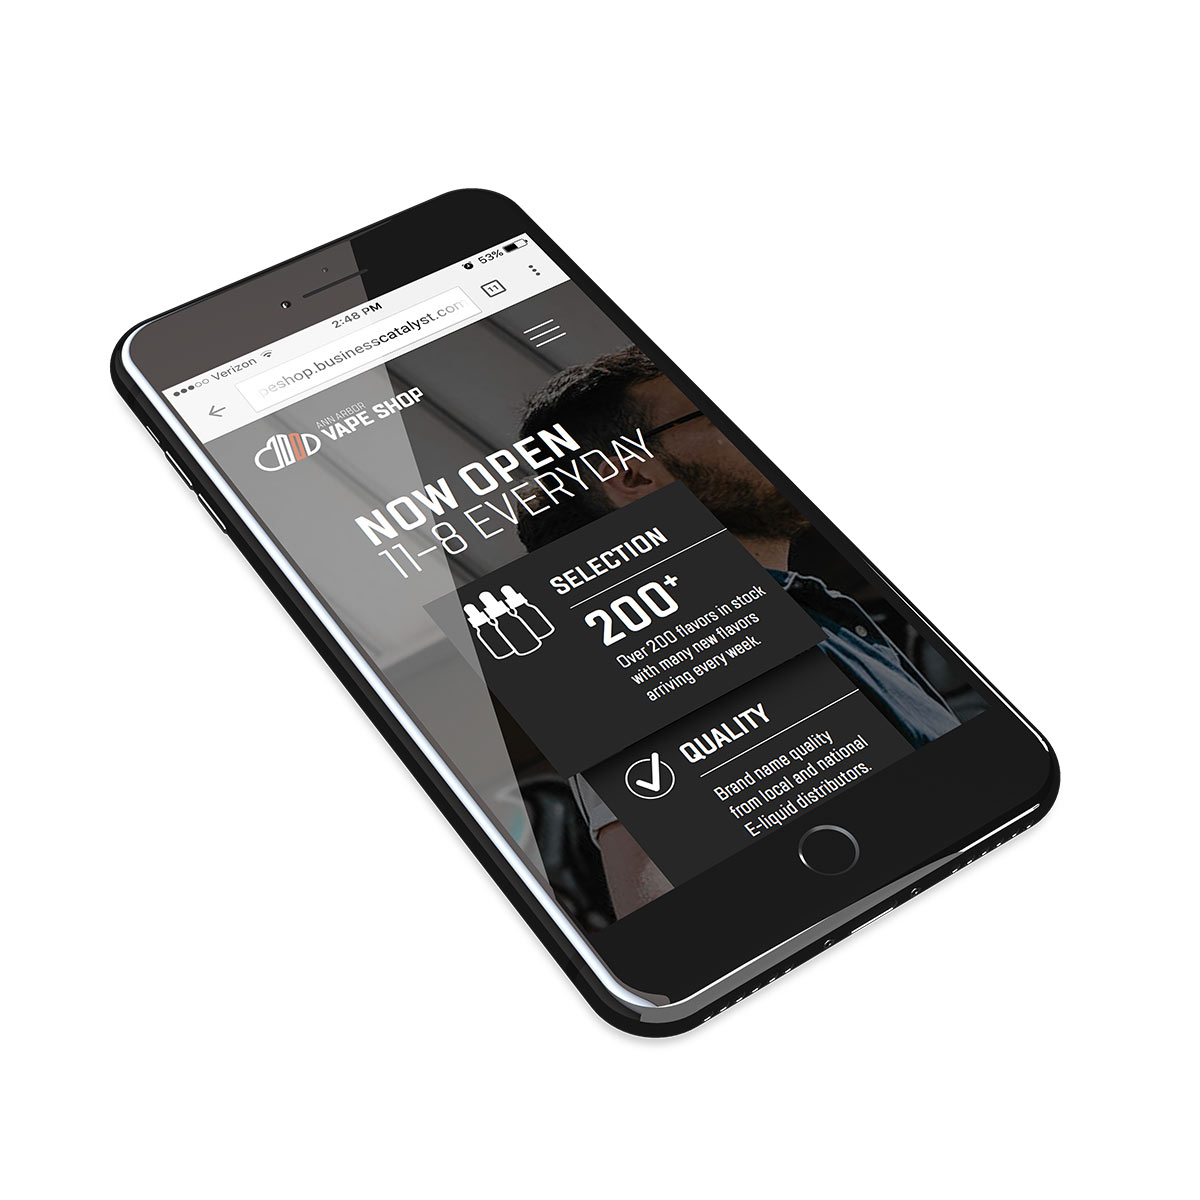 Ann Arbor Vape Shop mobile website displayed on an iPhone version 1